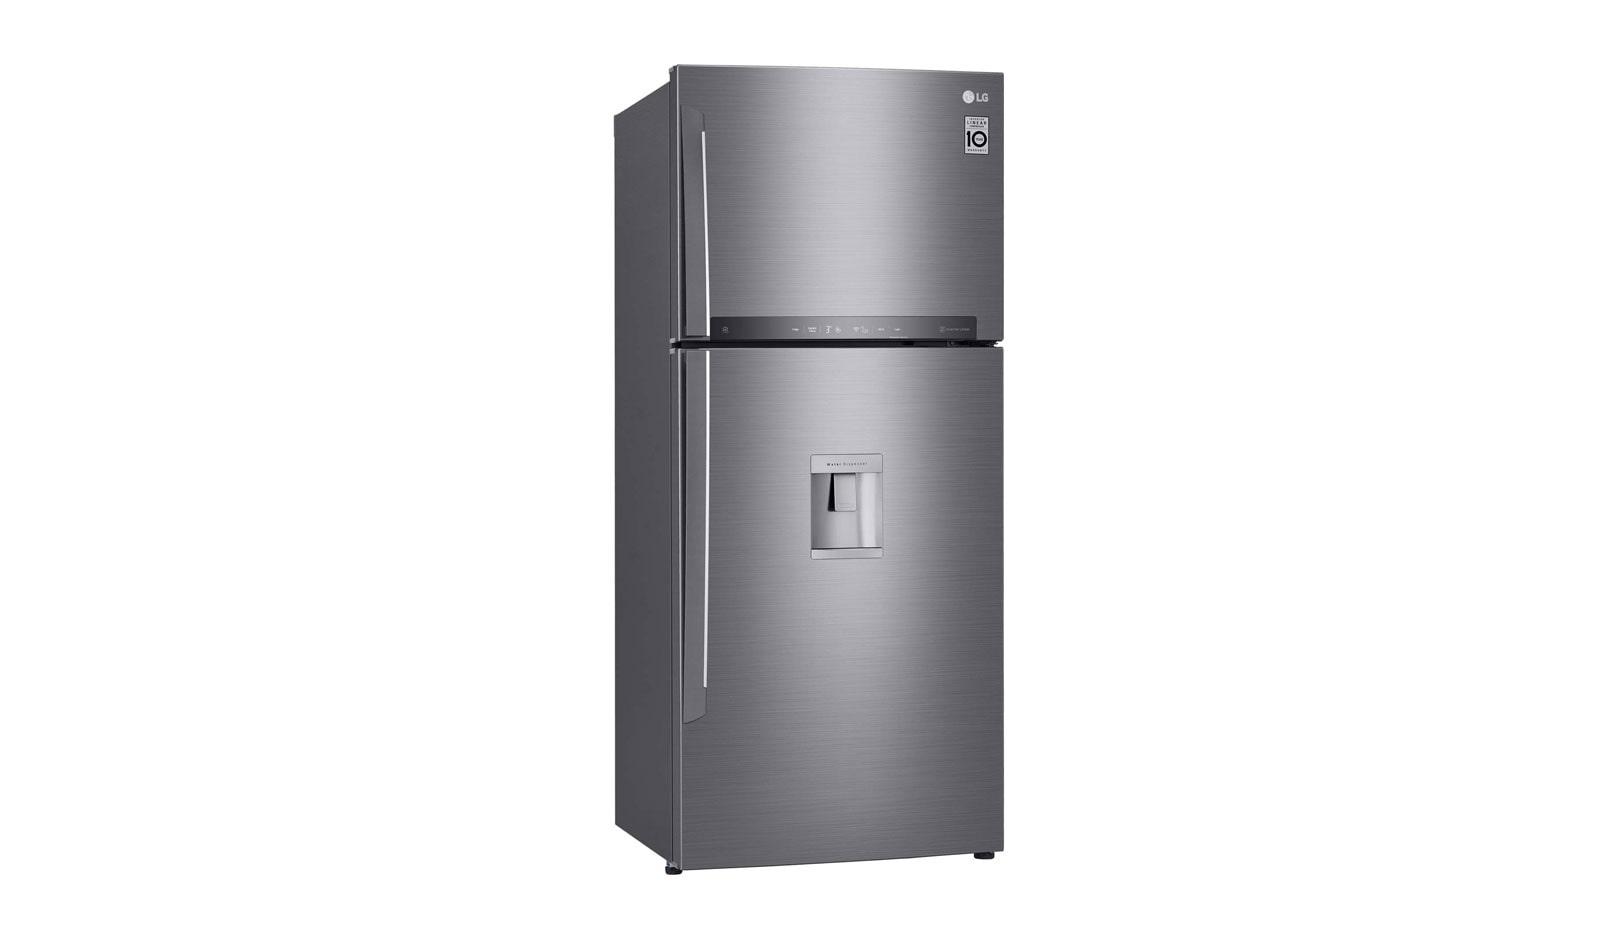 LG 437L Inverter Linear Compressor Refrigerator (10 year warranty) | LG  Central America and Caribbean